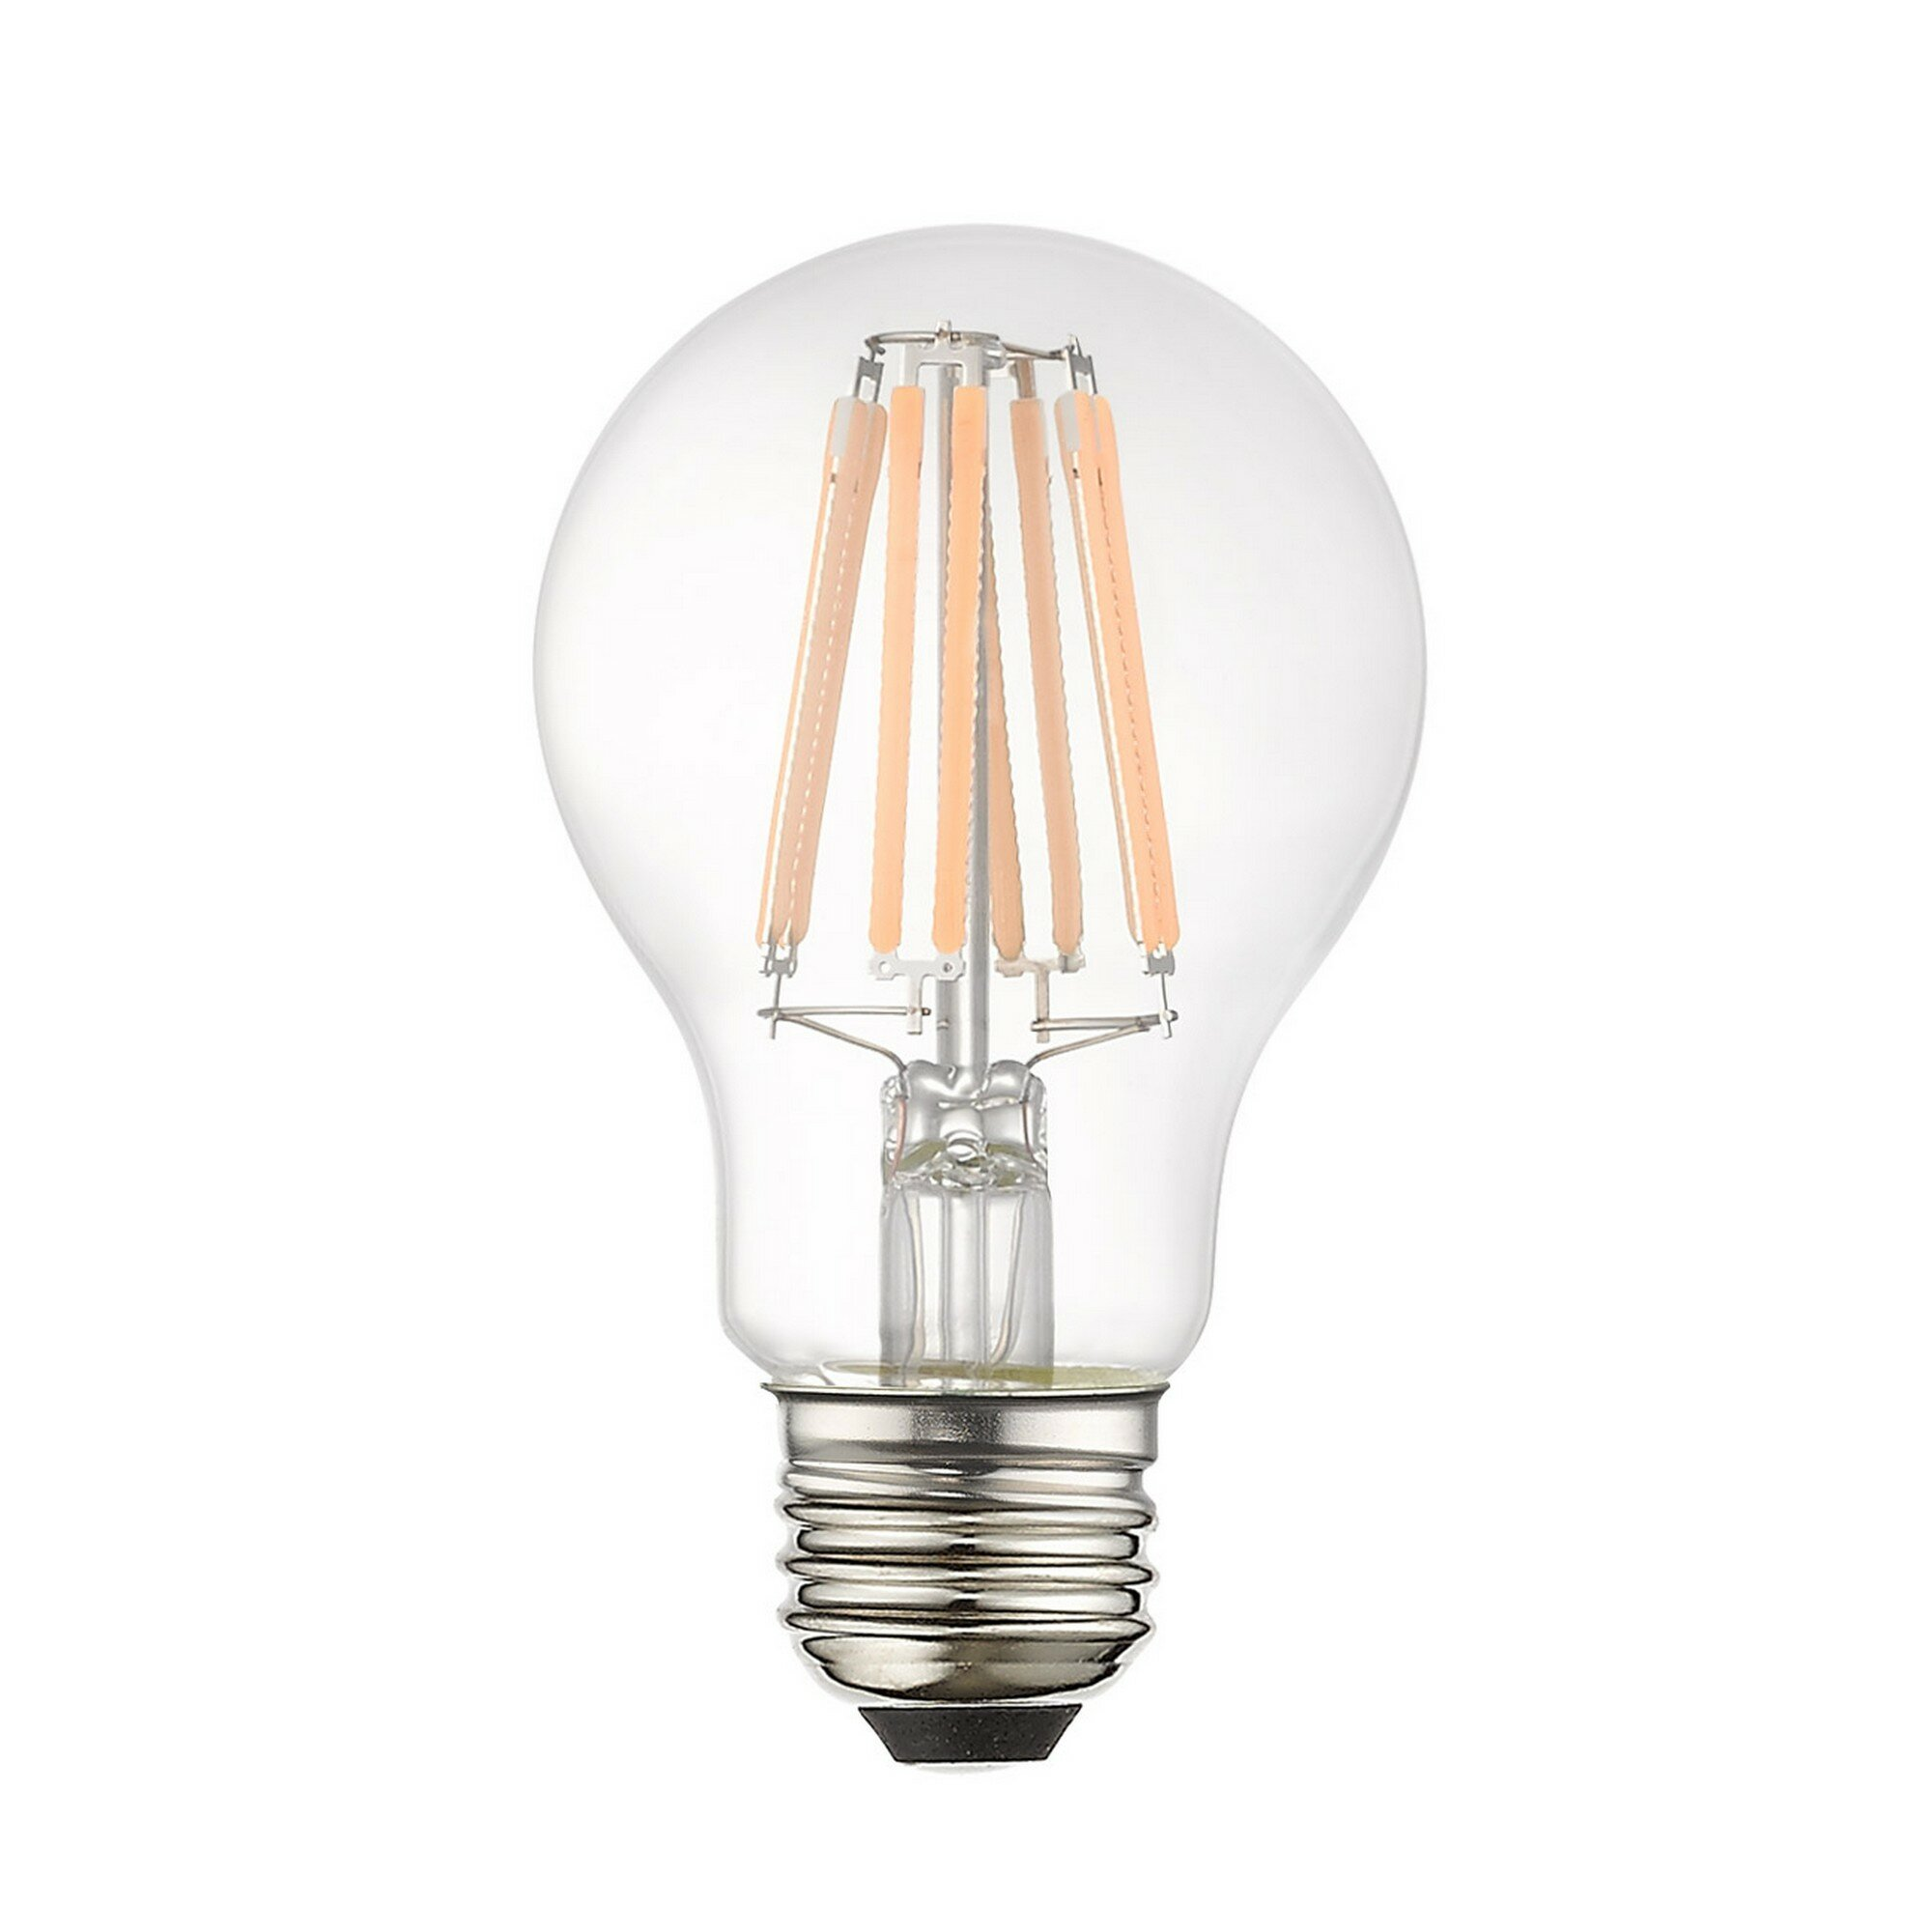 Livex Lighting 8 5 Watt 75 Watt Equivalent A19 Led Dimmable Light Bulb Soft White 3000k E26 Medium Standard Base Reviews Wayfair